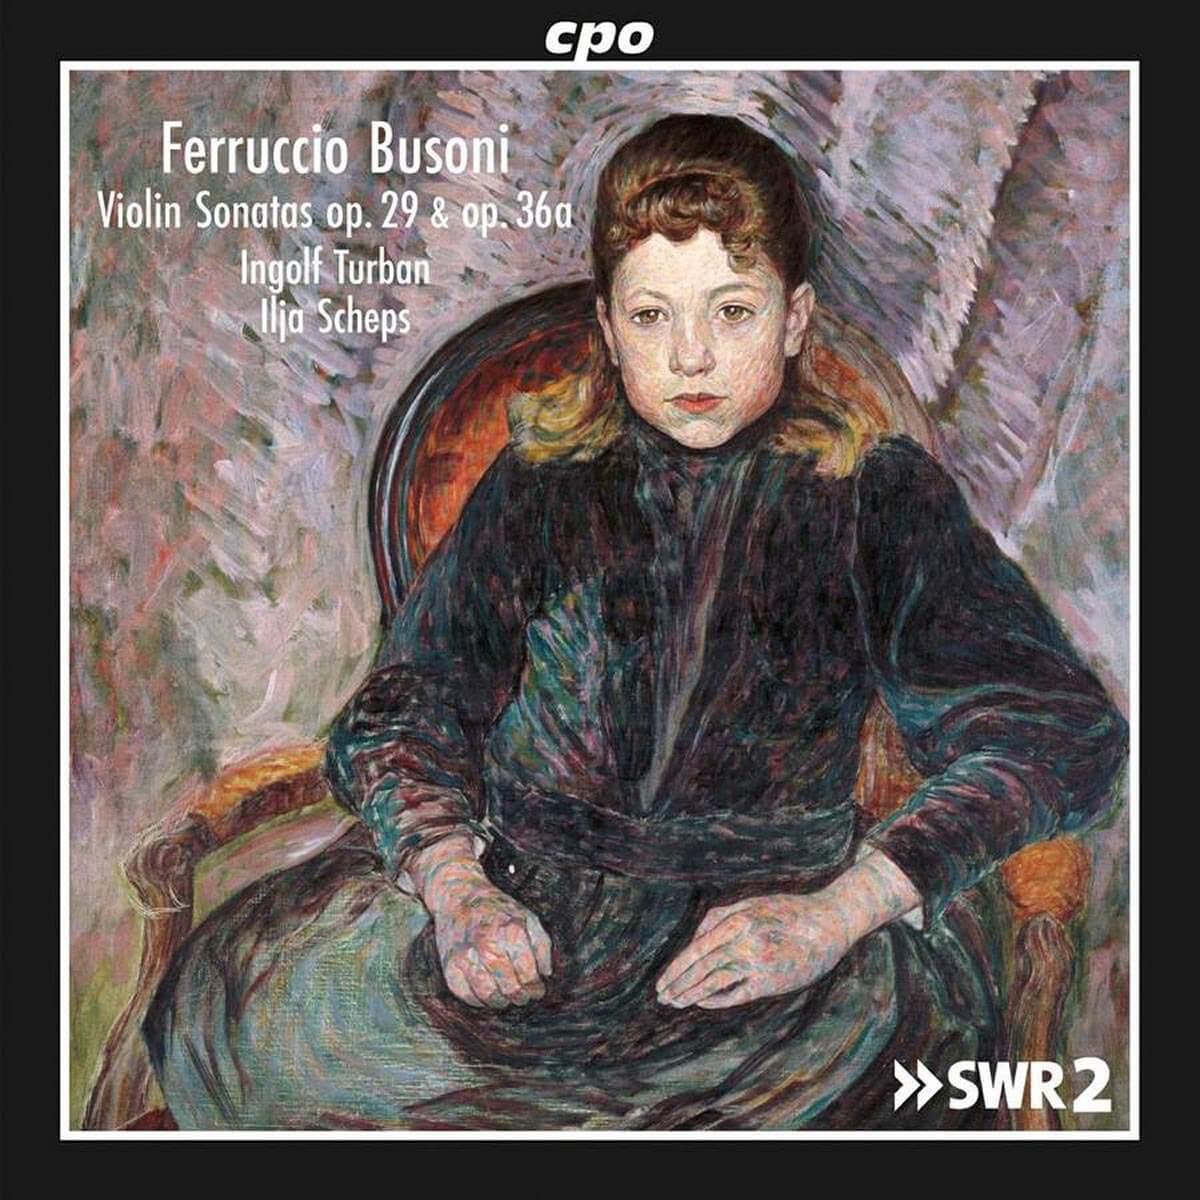 Ferruccio Busoni - violin sonatas